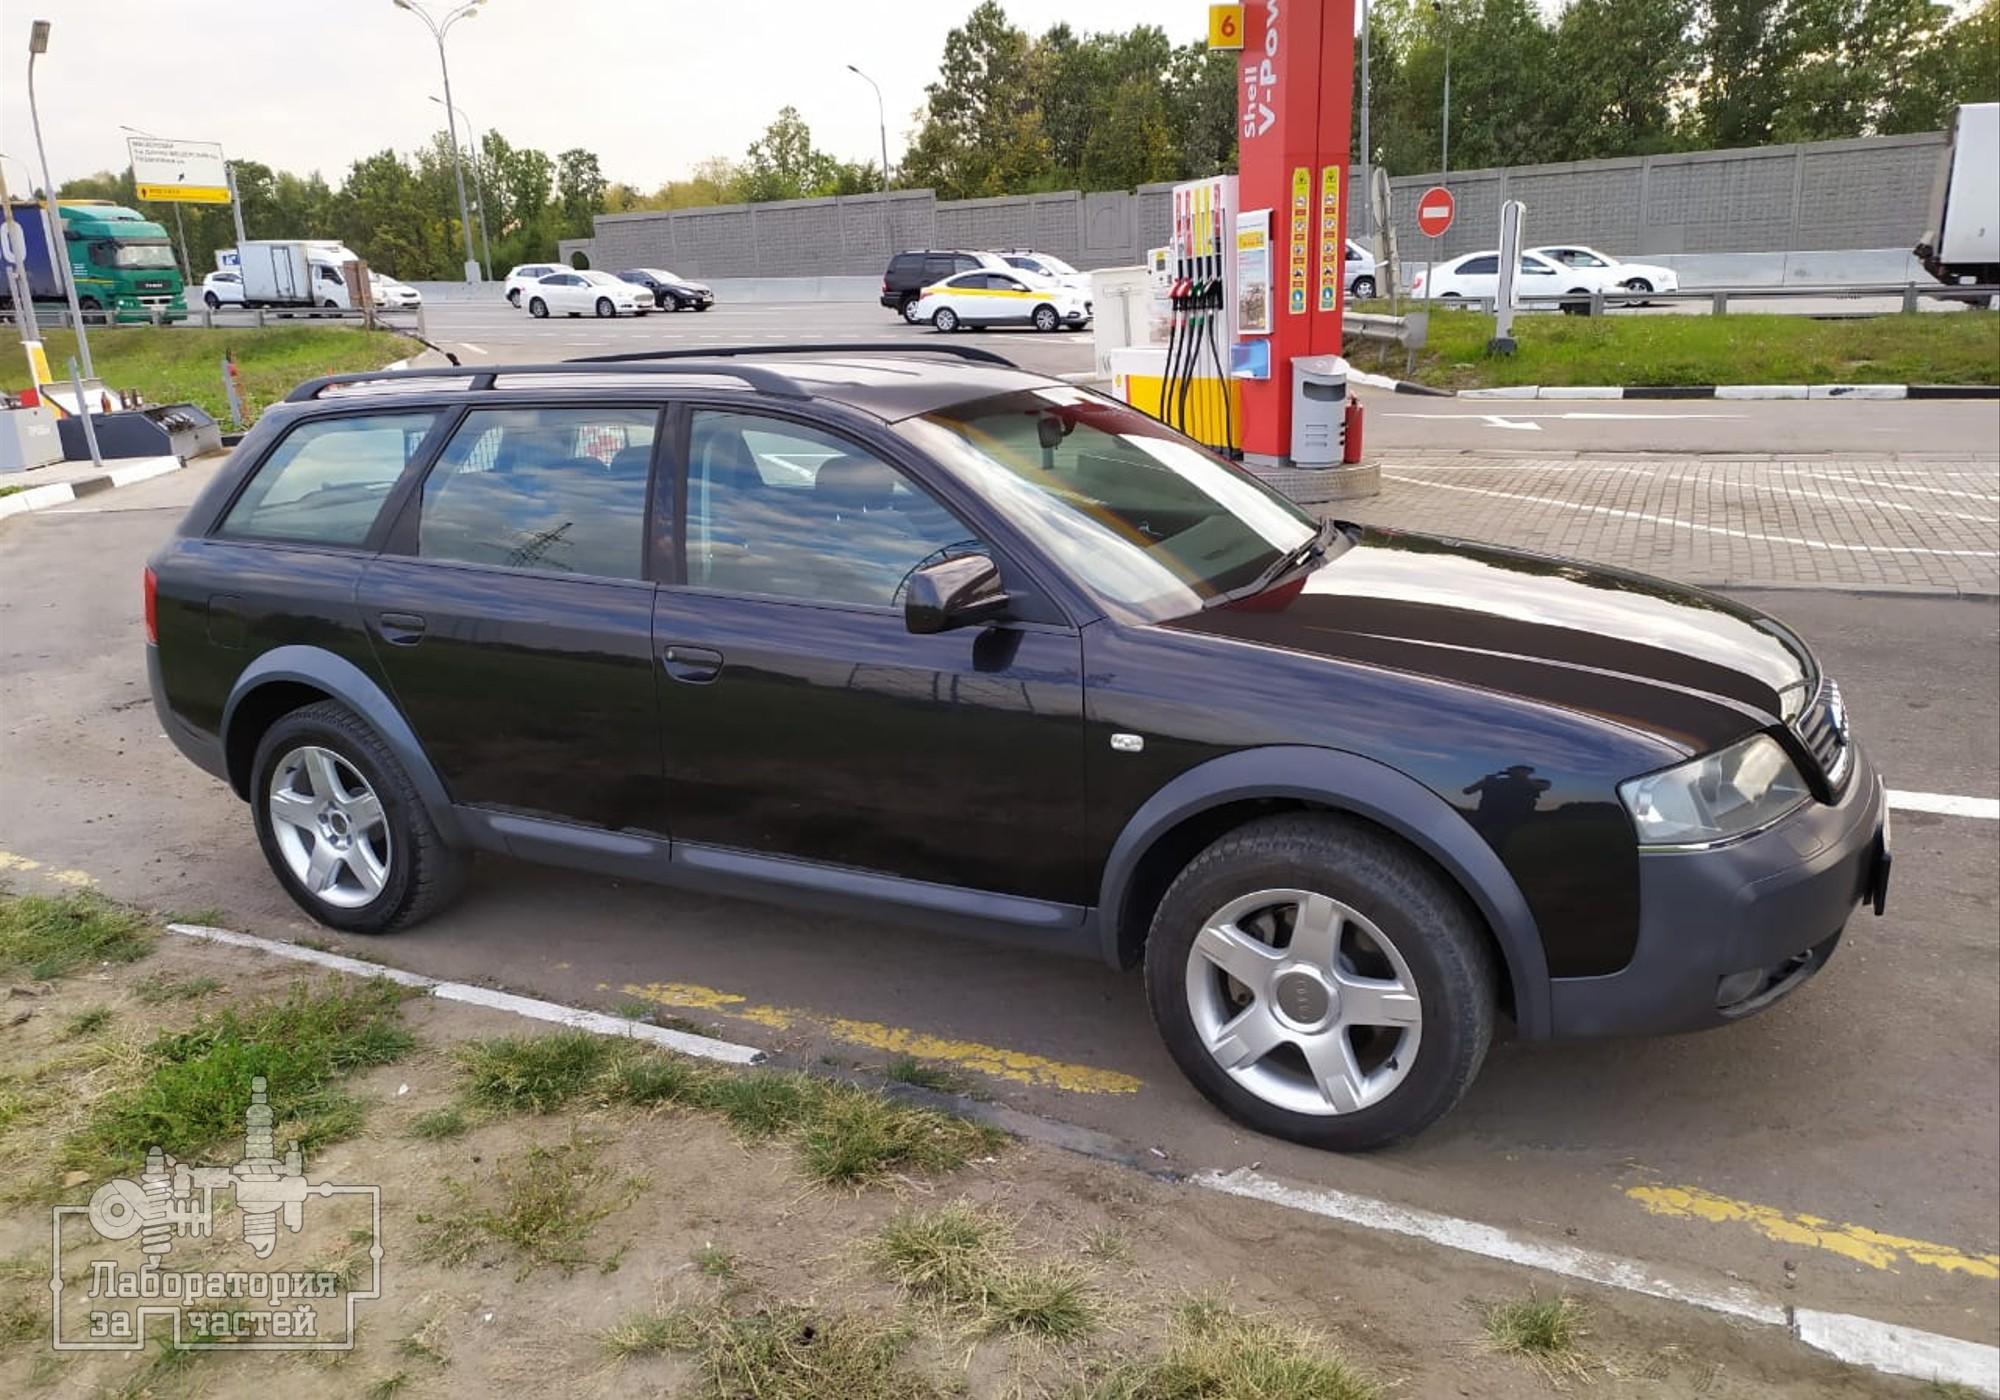 Audi Allroad 2004 г. в разборе